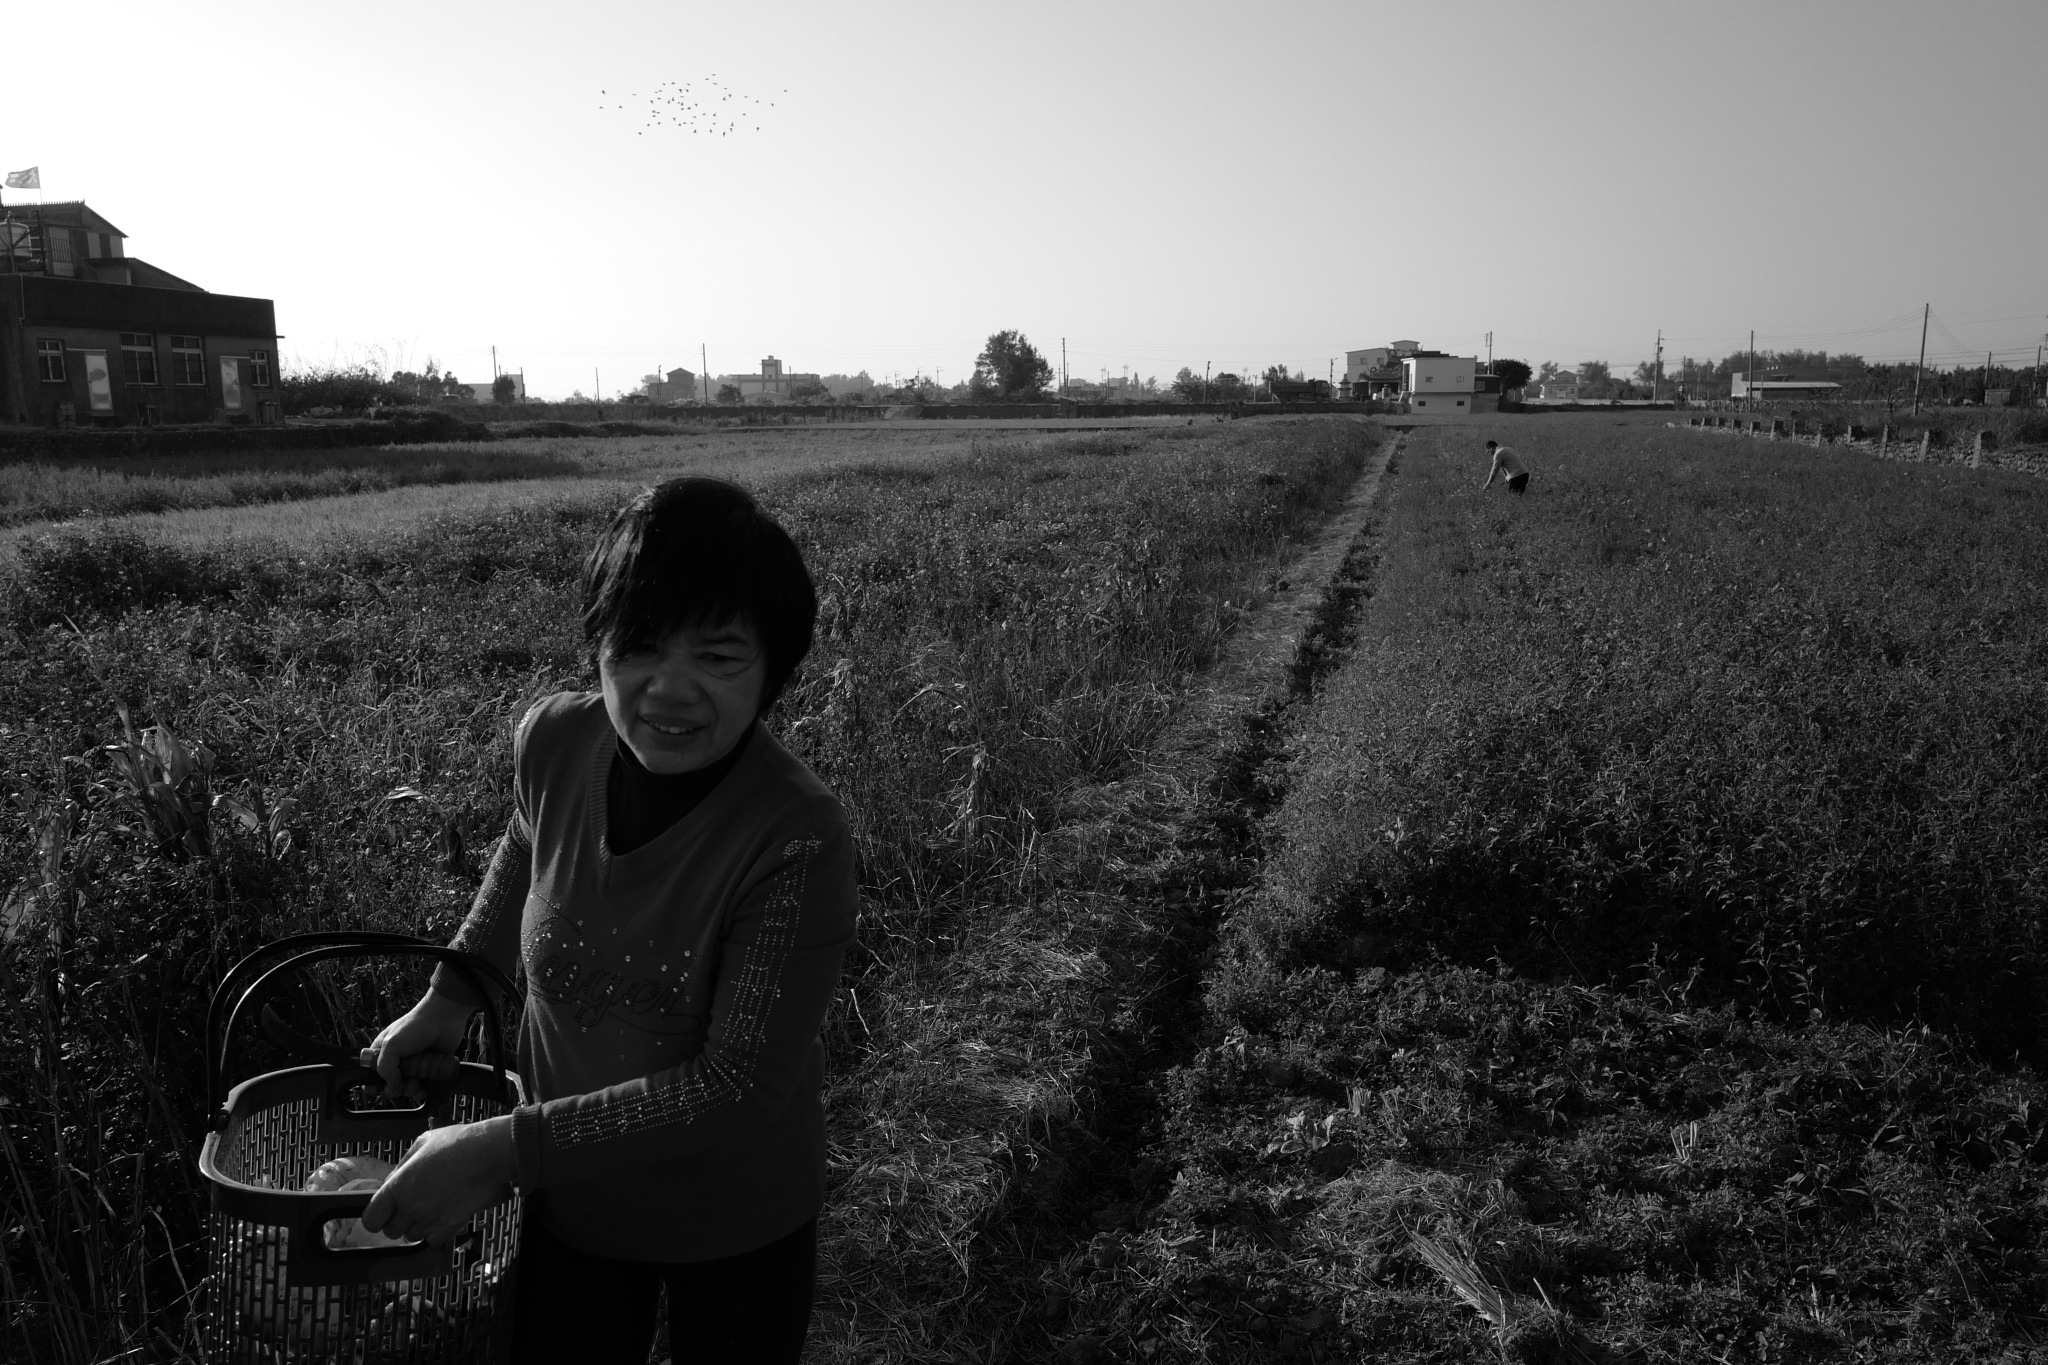 Country folk by HSIN-YUAN,CHENG